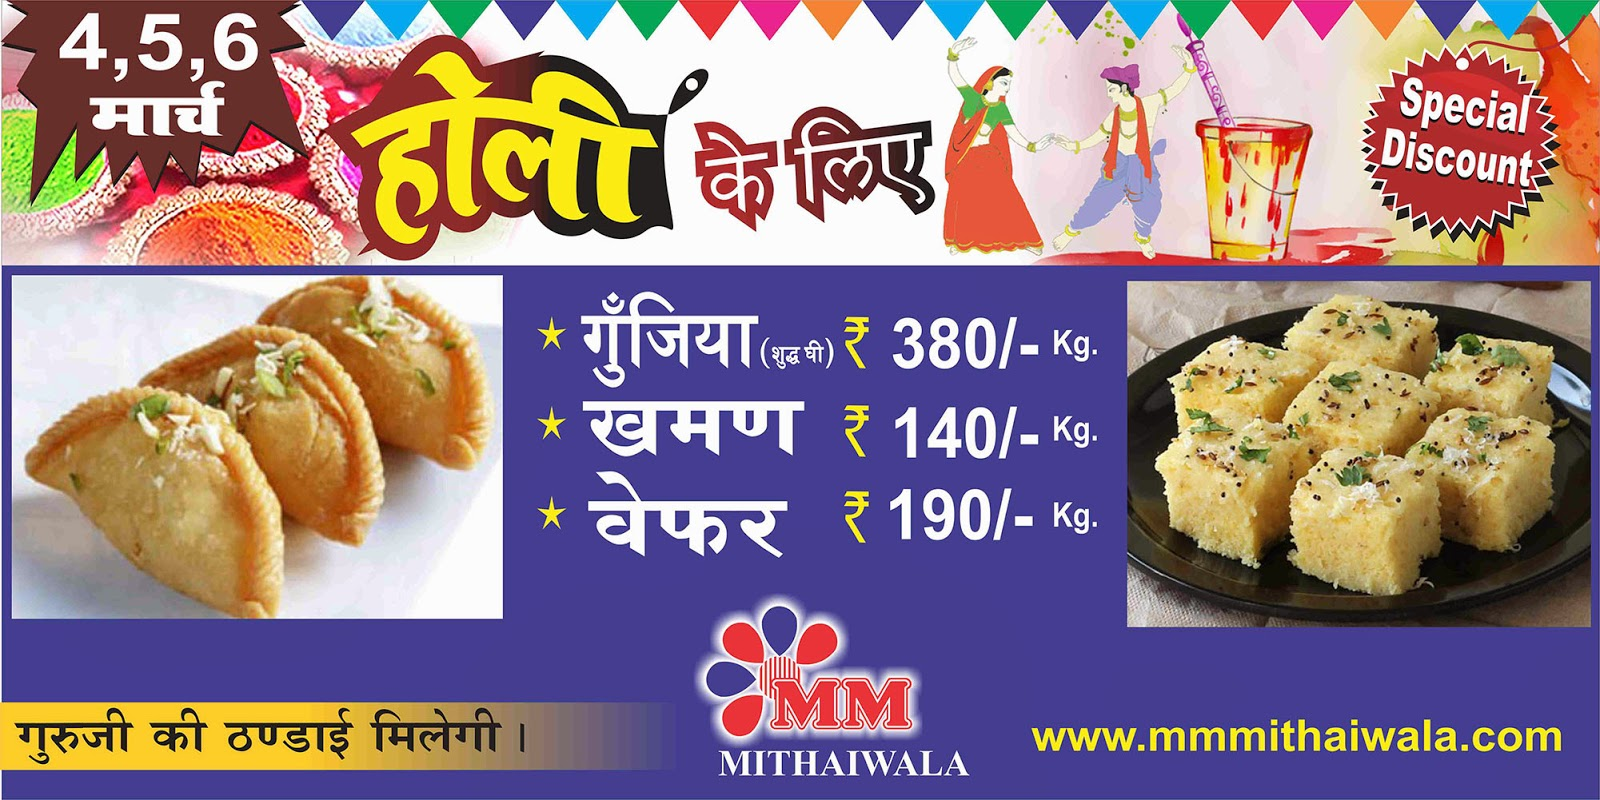 www.mmmithaiwala.com